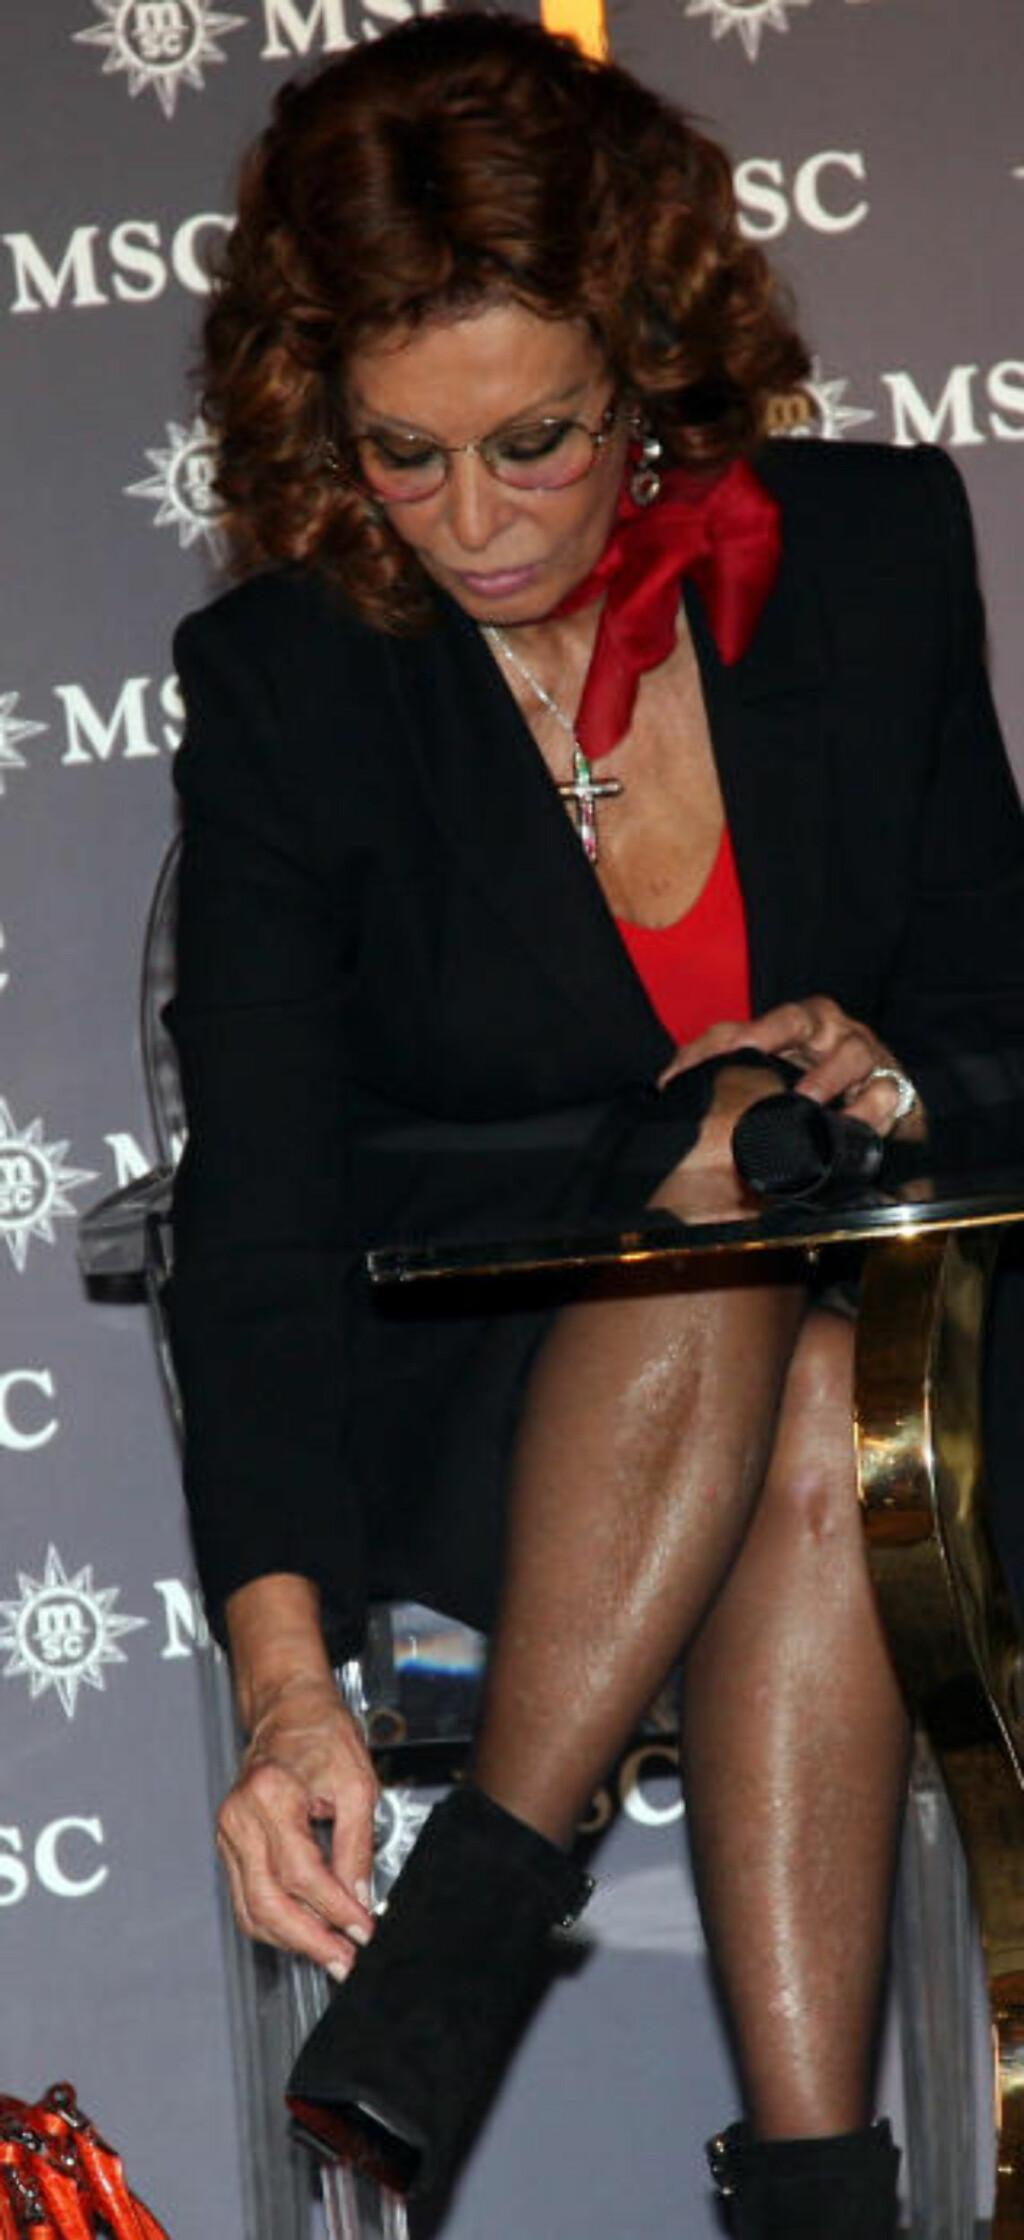 DÅPSREKORD: I helgen satte Sophia Loren en nesten uslåelig rekord. For tiende gang besørget hun at prosecco-flasken knuste som den skulle under en skipsdåp. Denne gang var det velvoksne «Msc Preziosa» som ble døpt i Genova. Foto: EIVIND PEDERSEN